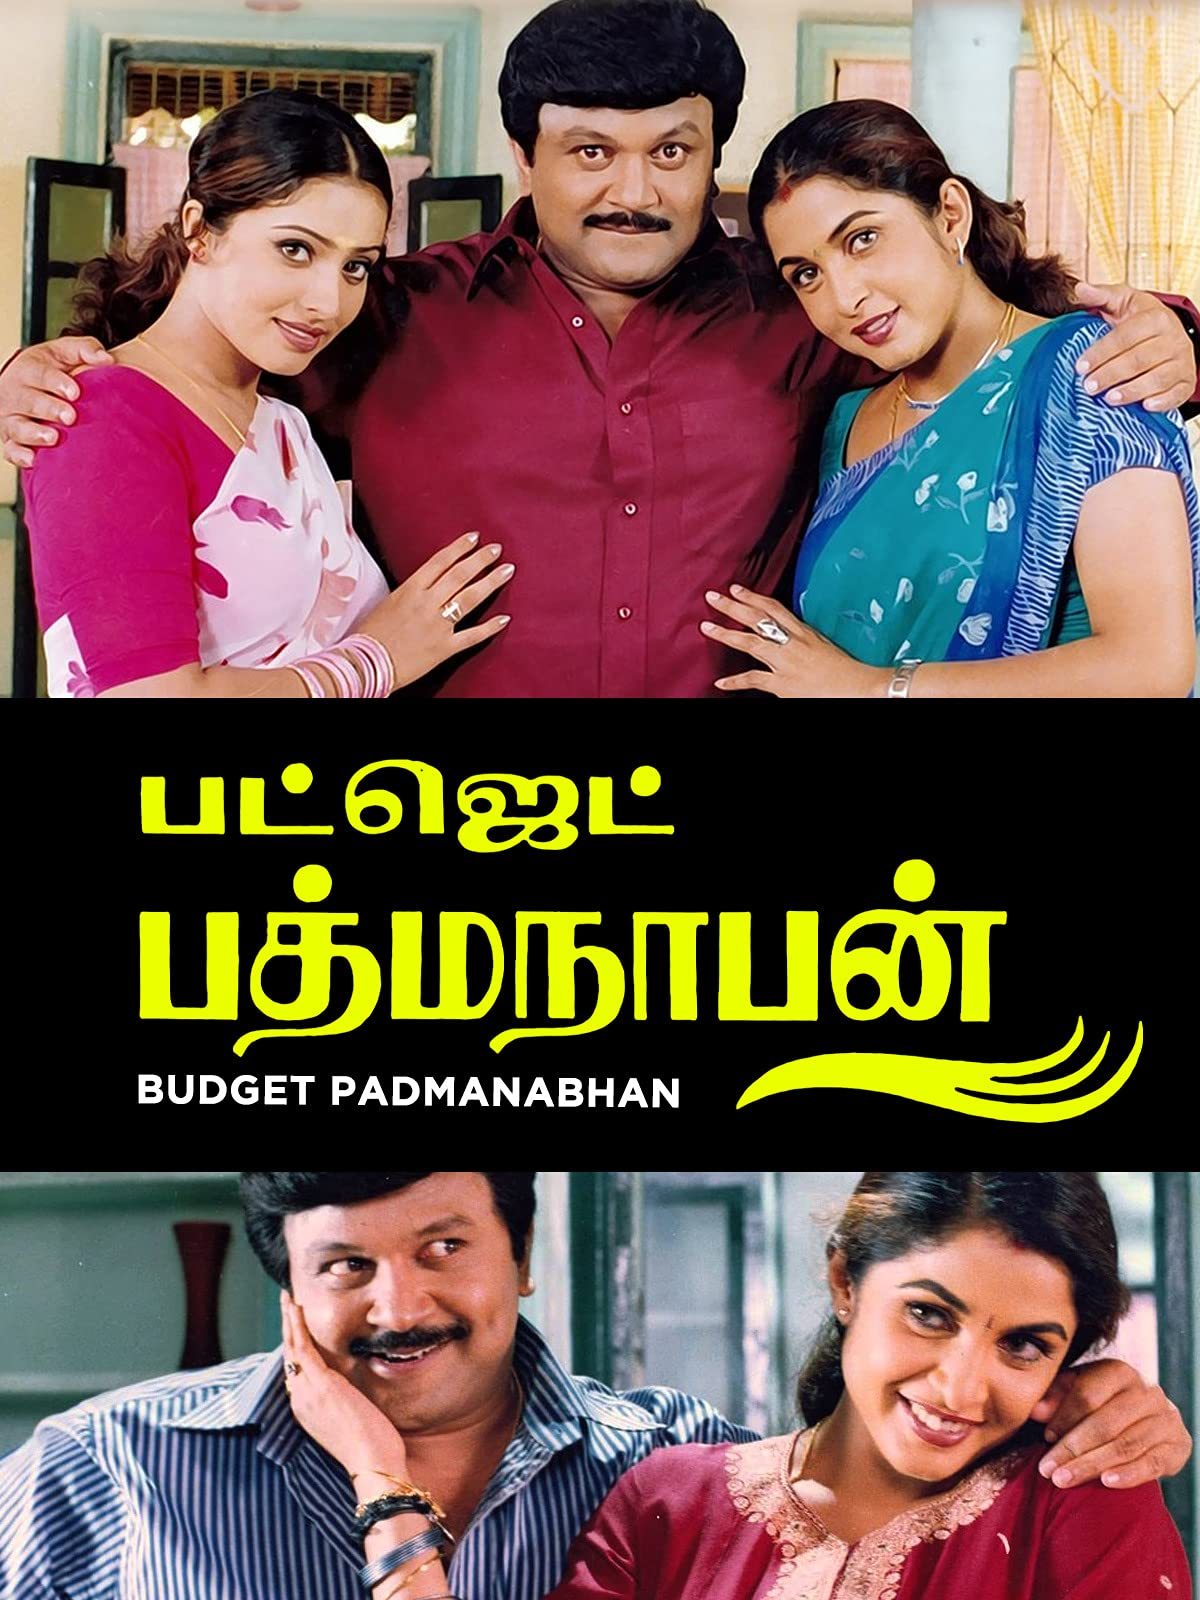 Budget Padmanabhan